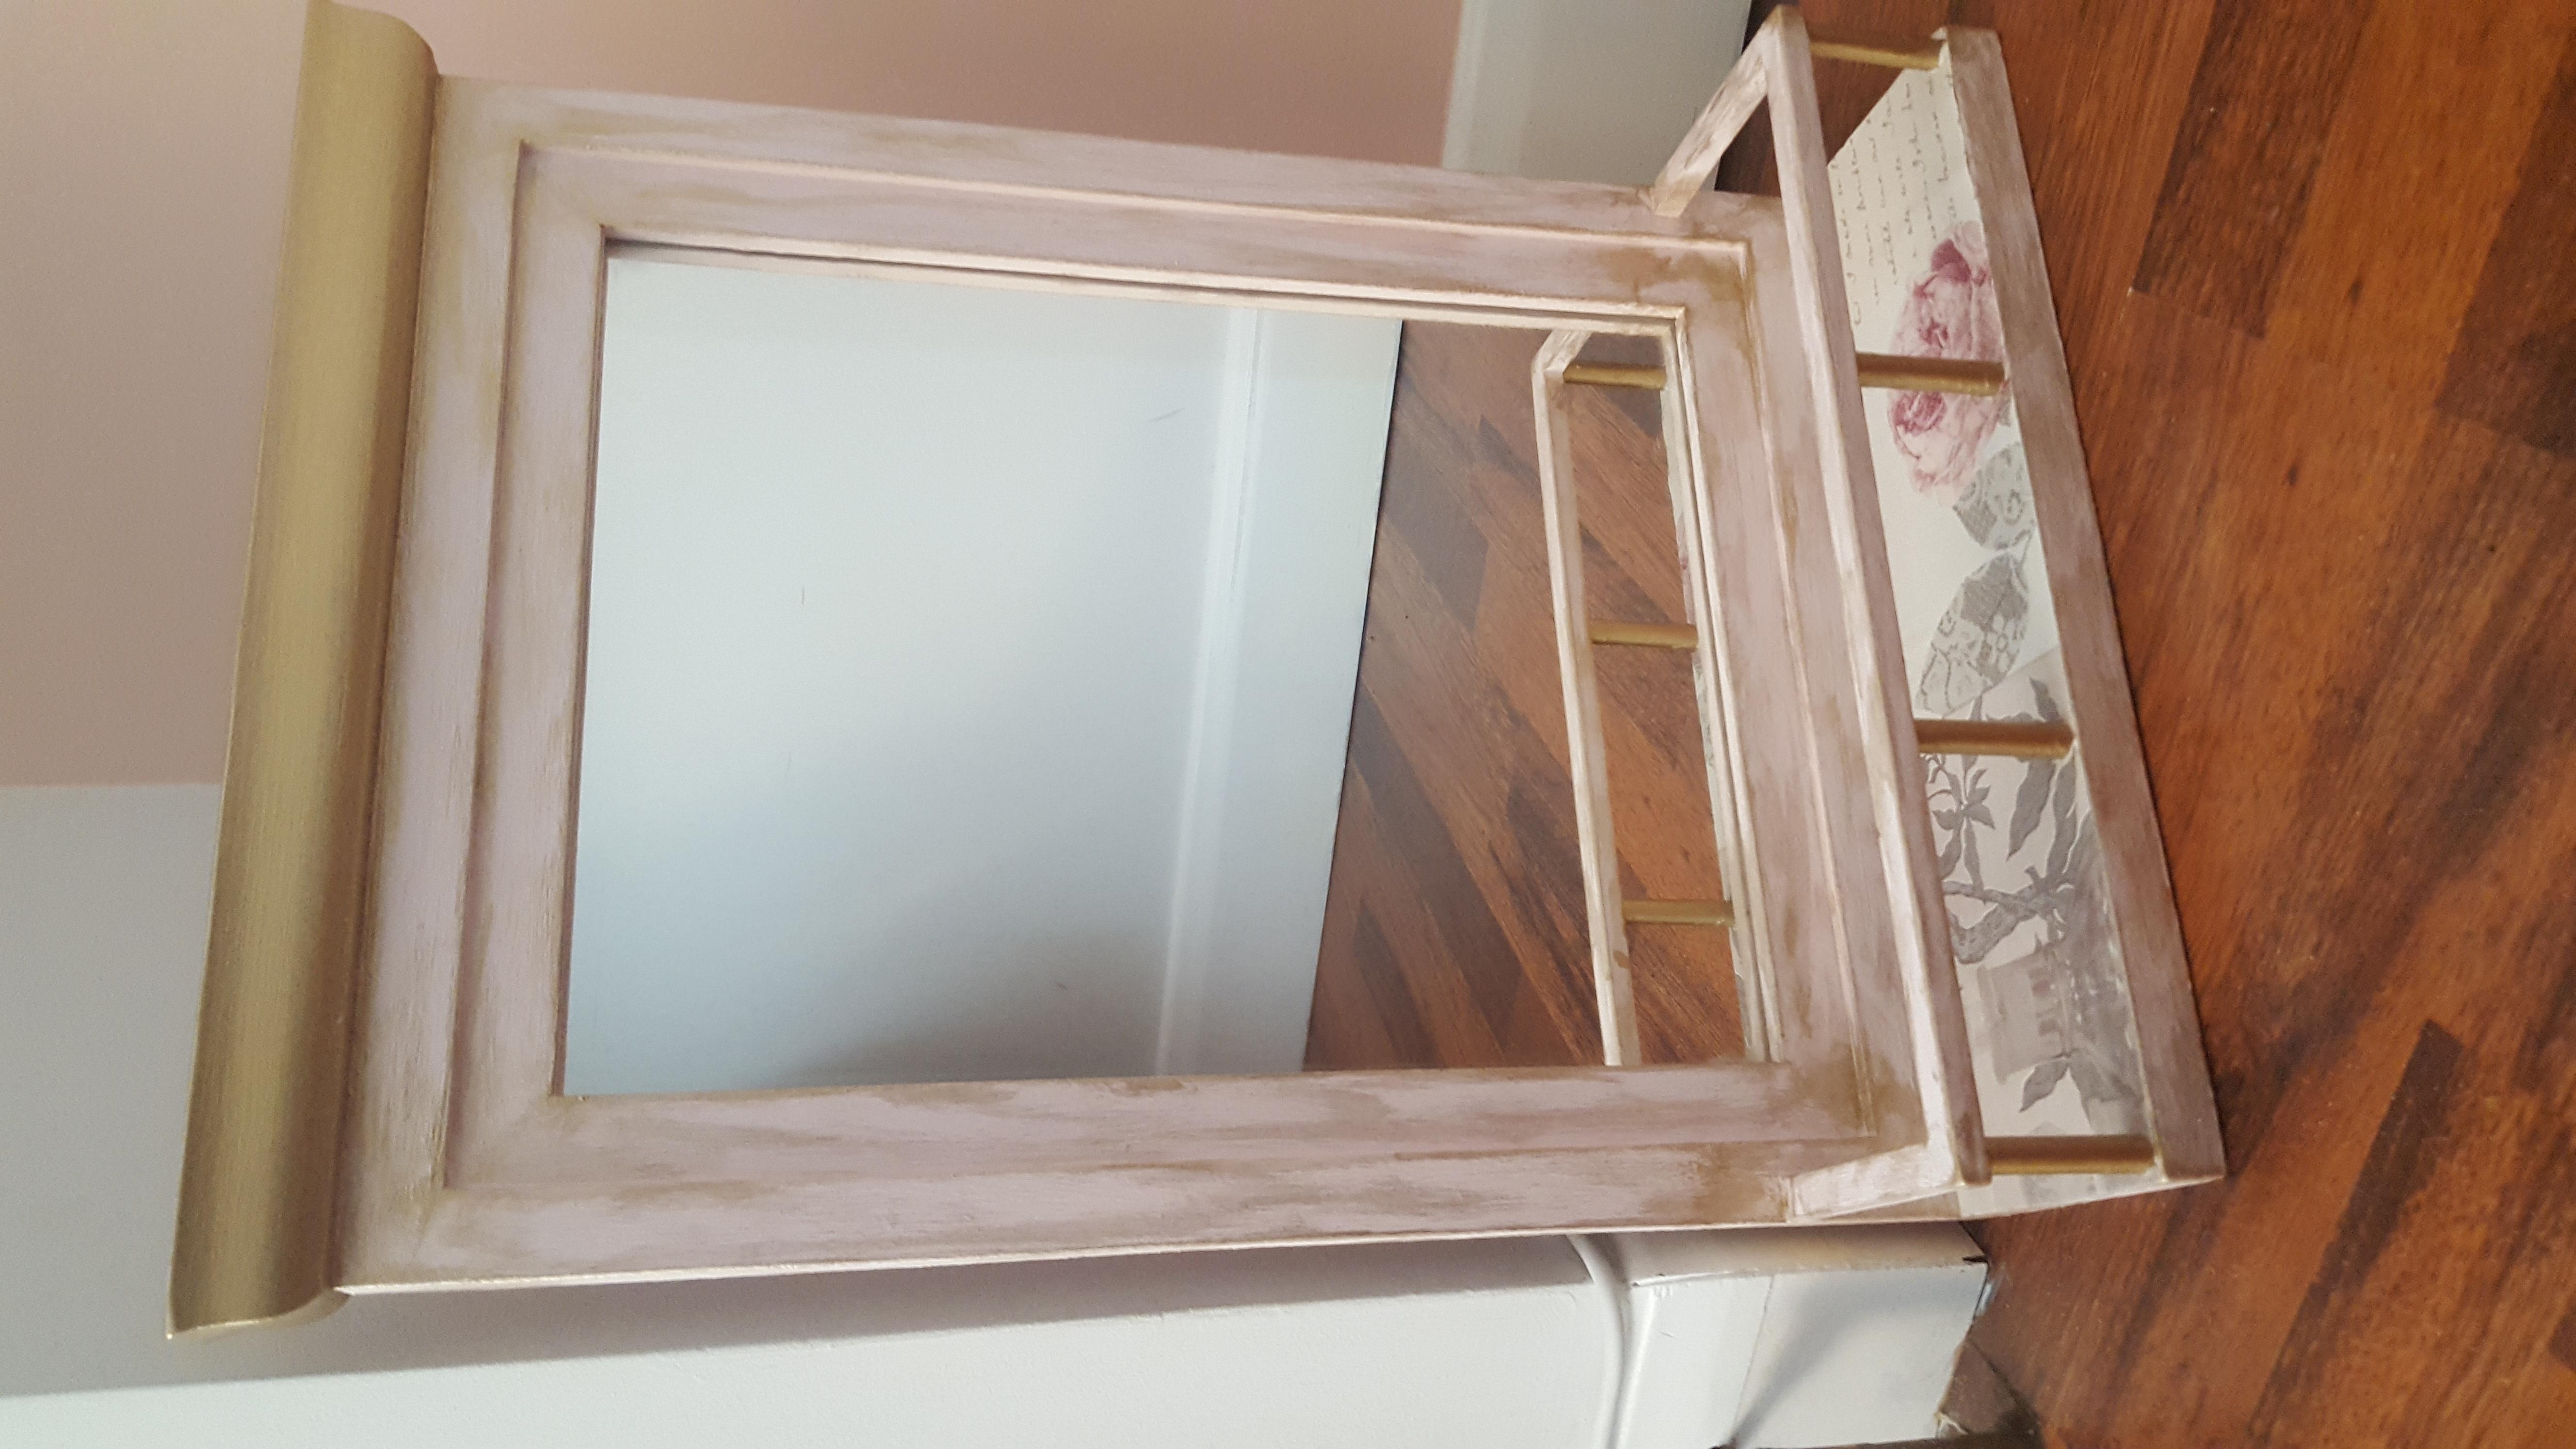 Vanity Mirror - SOLD